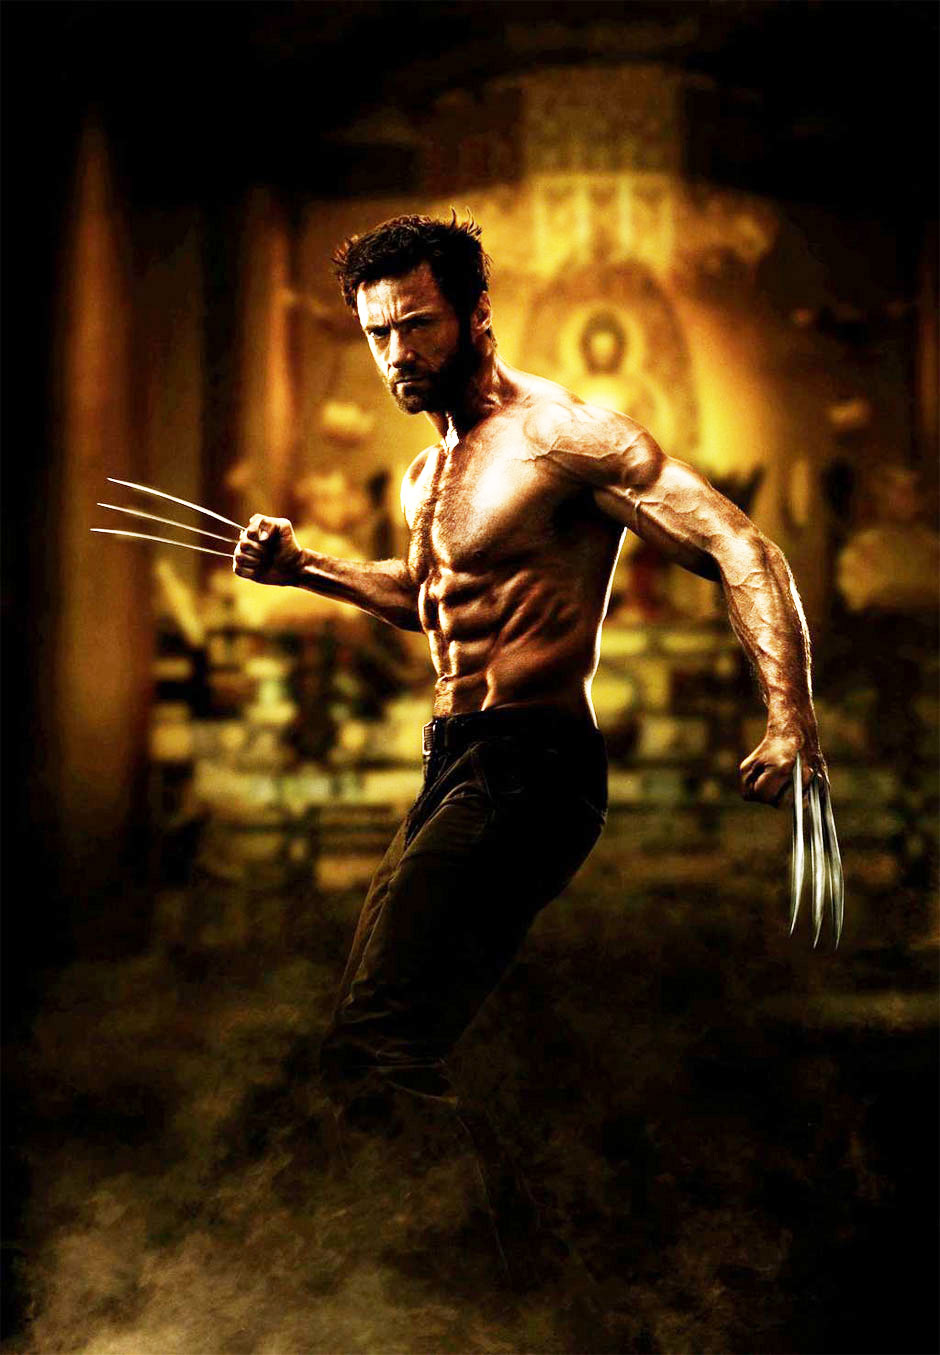 The Wolverine - Movie Poster #3 (Original)